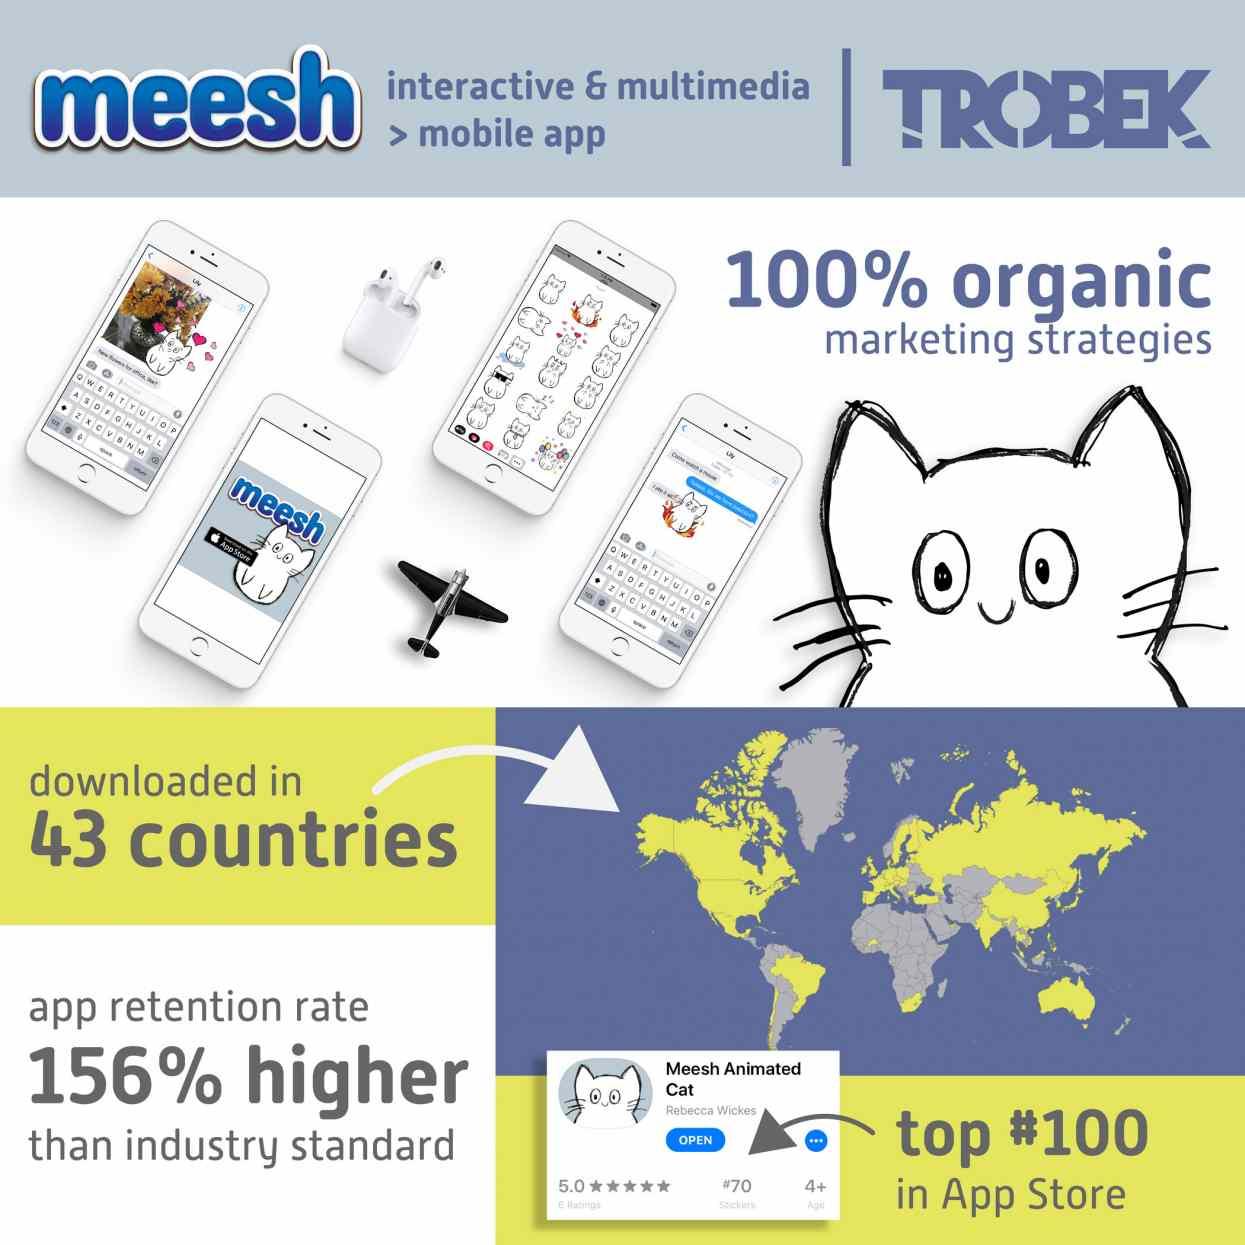 Meesh Mobile App Infographic - Rebecca Wickes